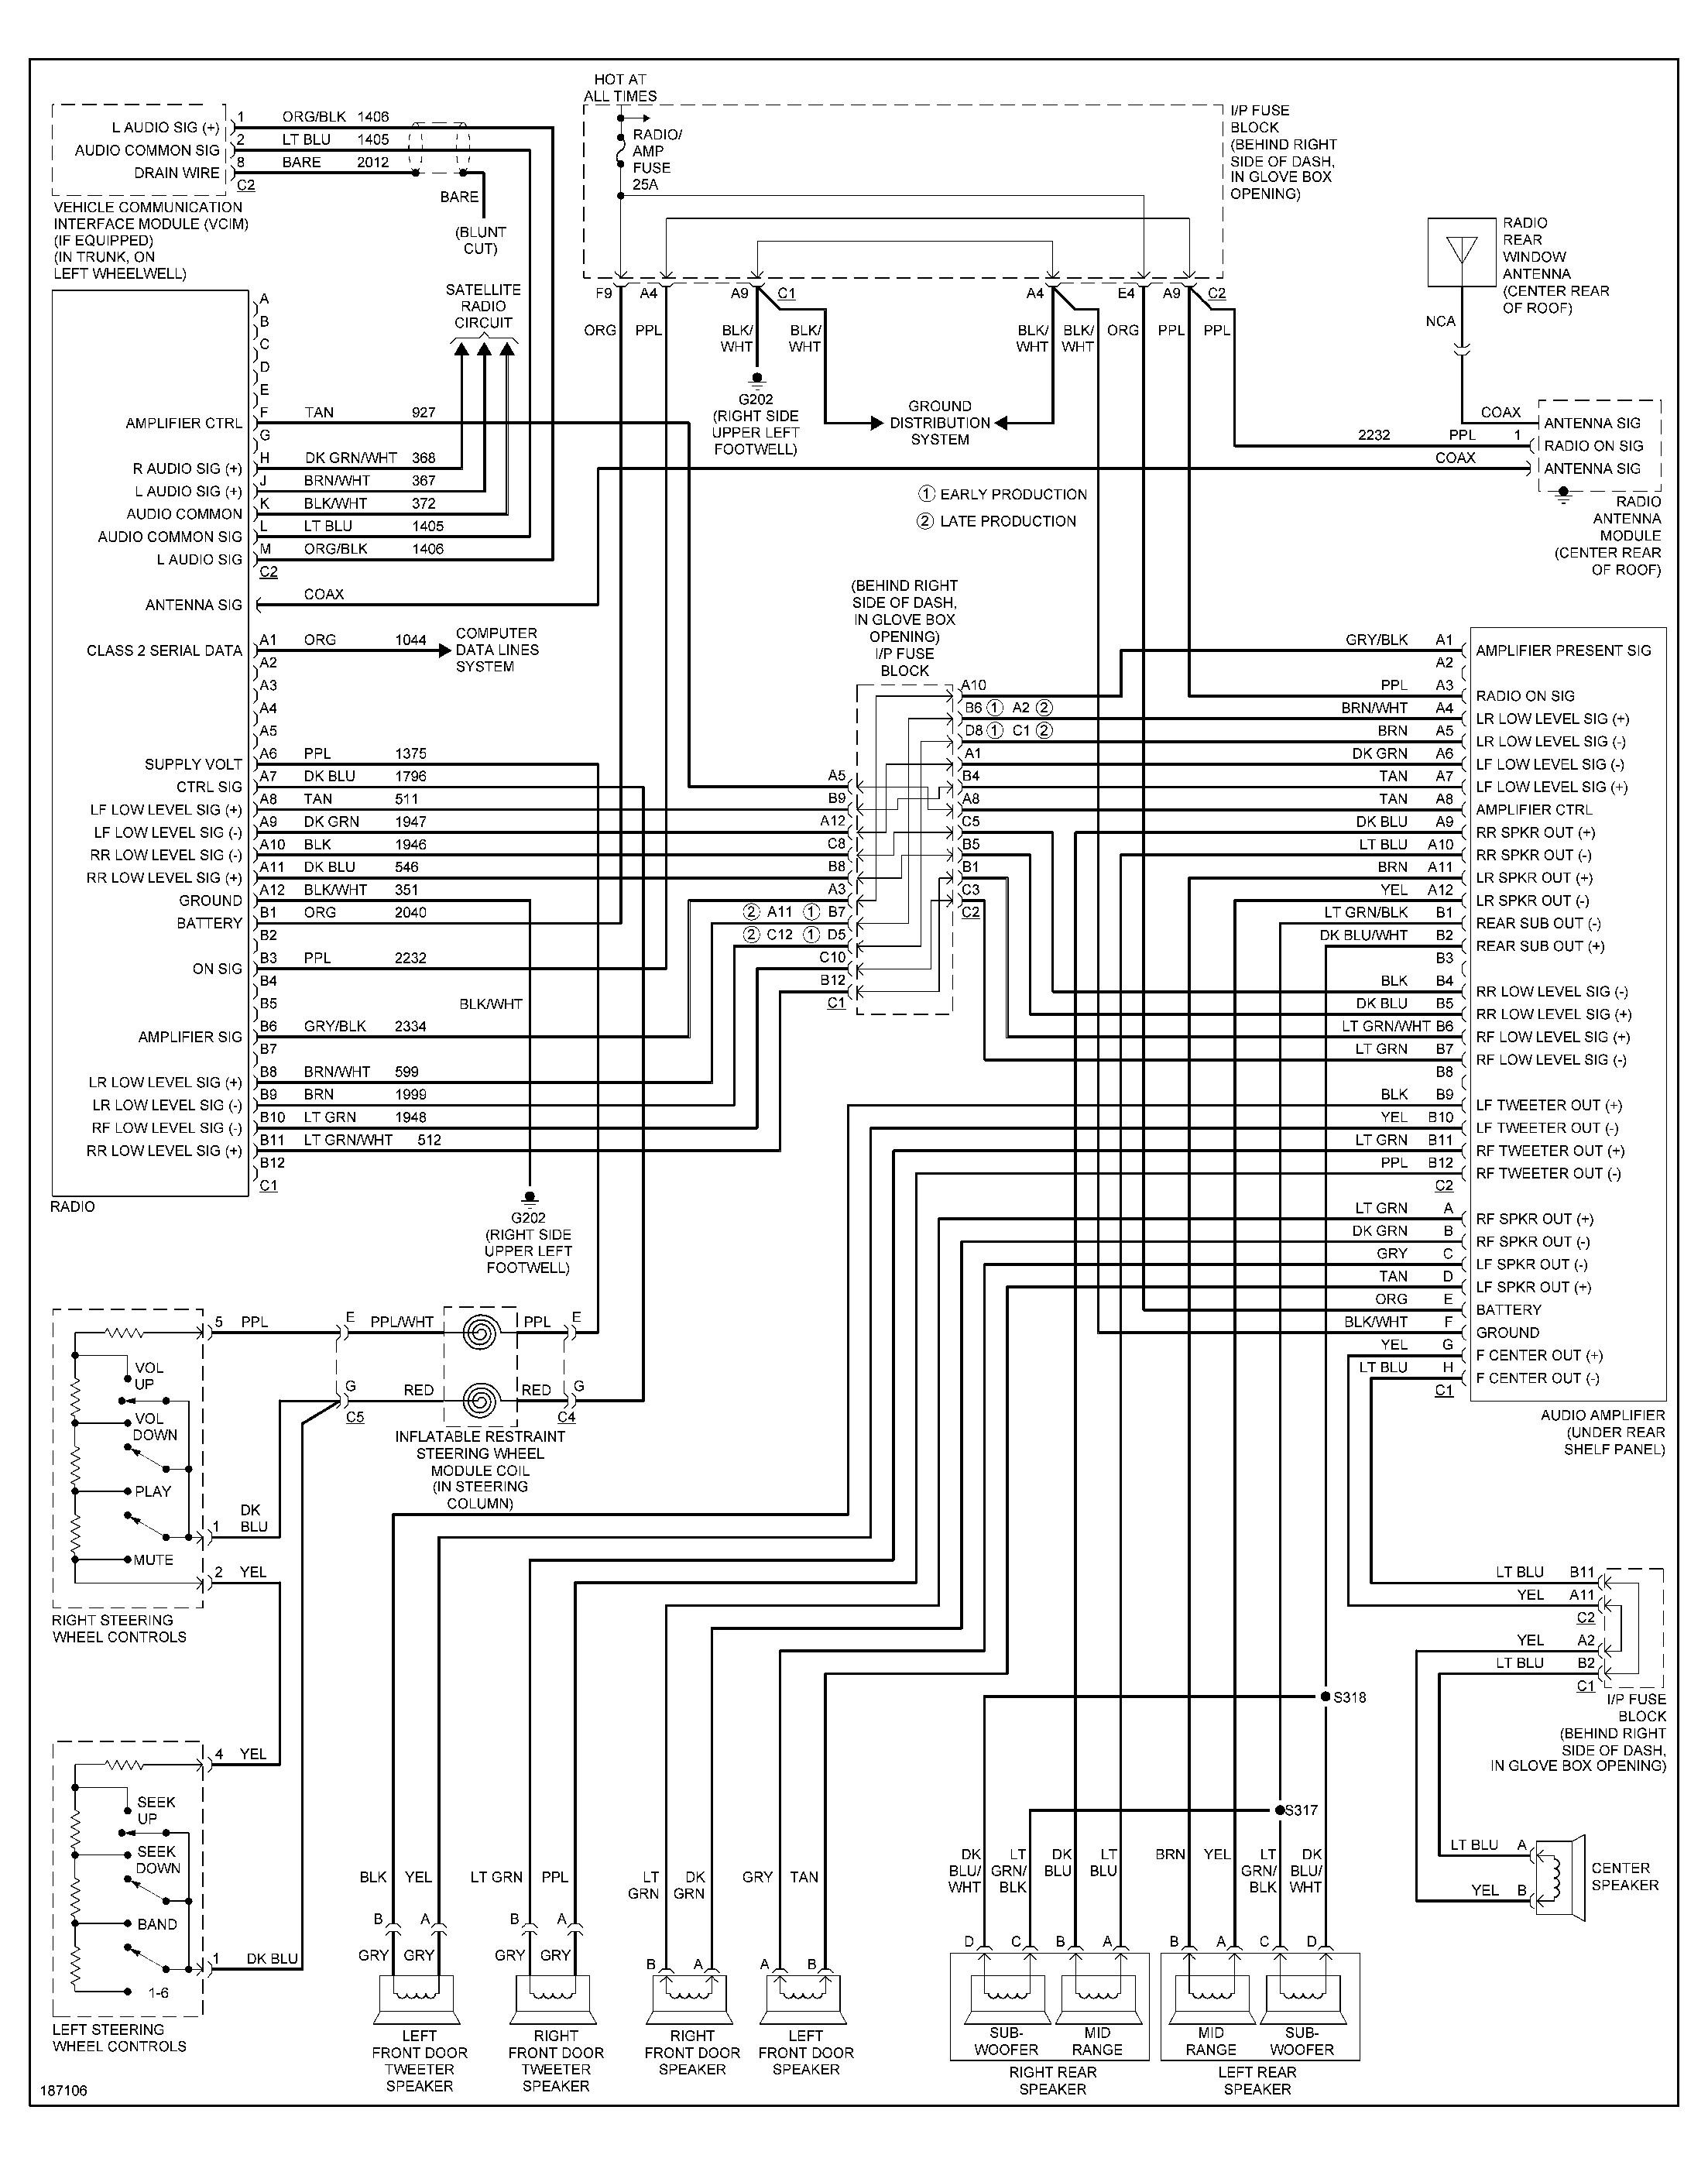 diagram] 2003 pontiac aztek radio wiring diagram full version hd quality  wiring diagram - diagramaxxi.climadigiustizia.it  diagram database - climadigiustizia